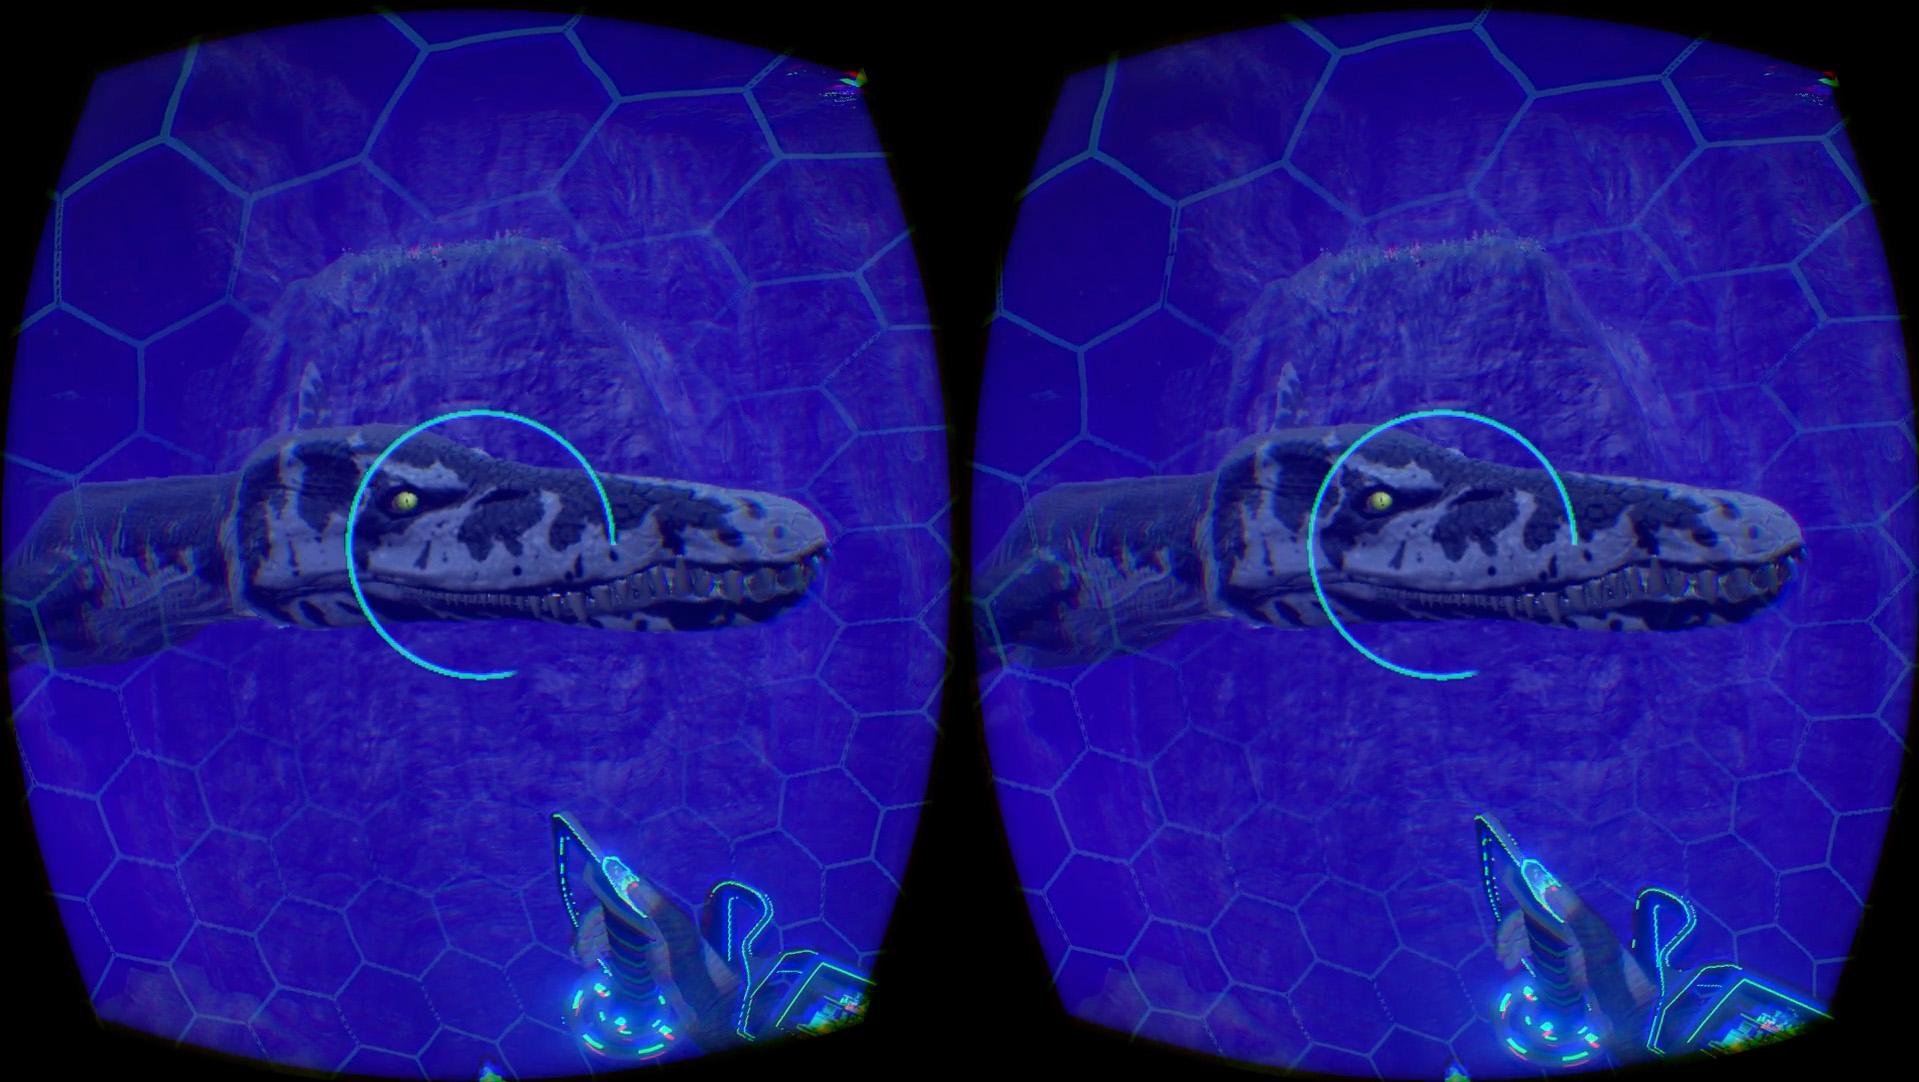 Time-Machine-VR-Oculus-Rift-demo-3